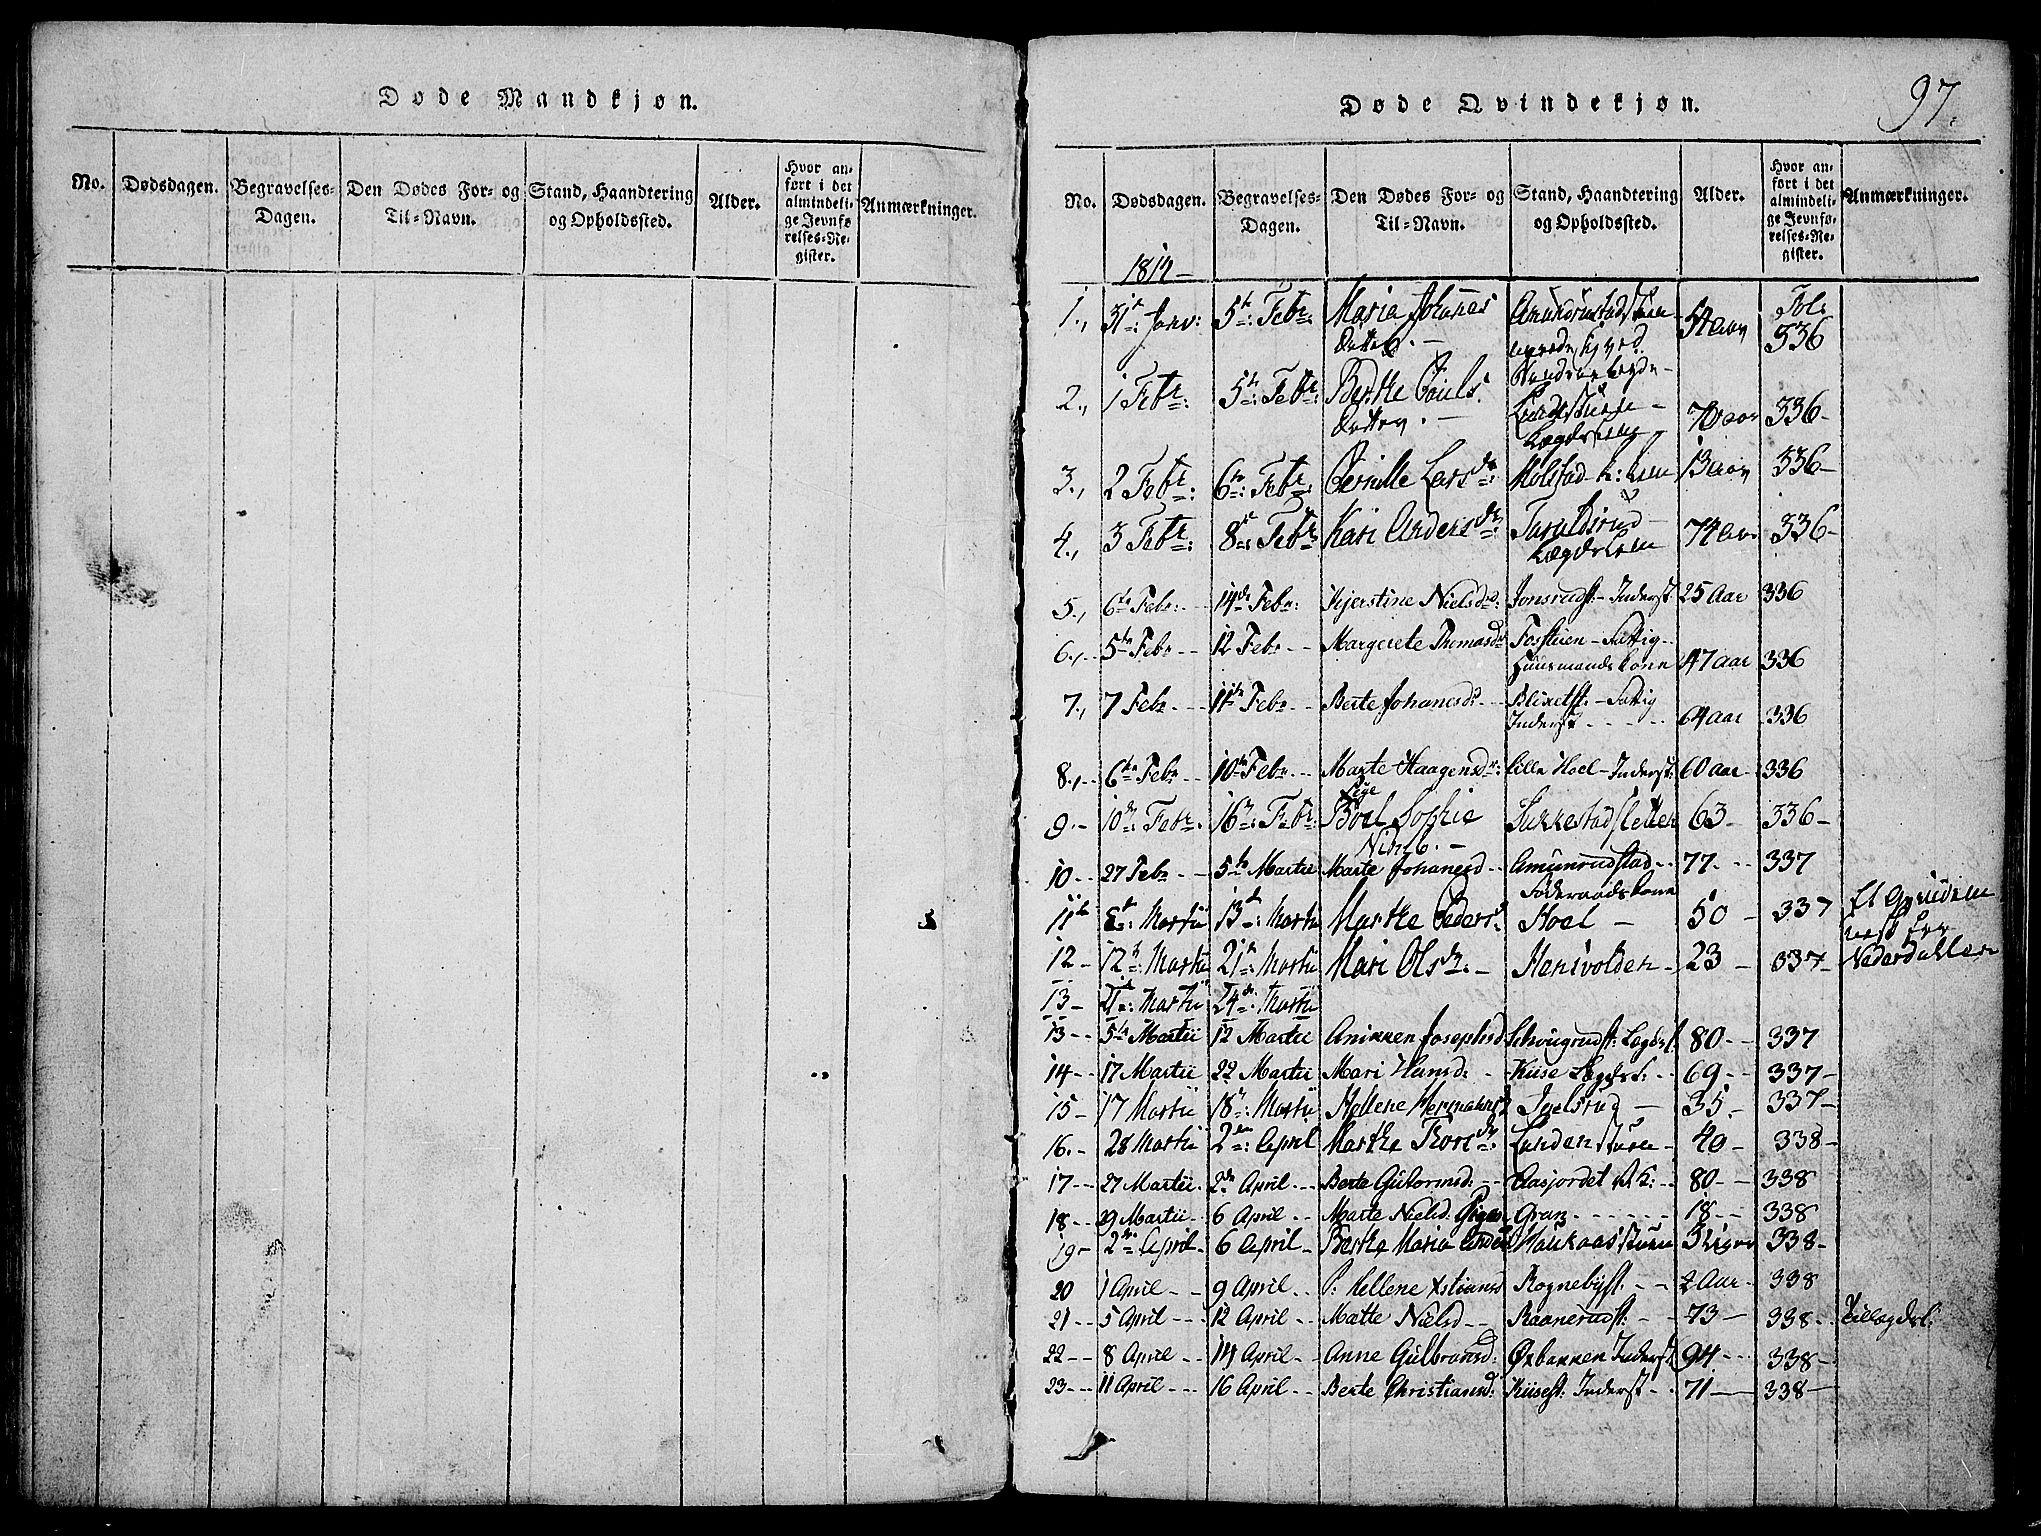 SAH, Toten prestekontor, Ministerialbok nr. 9, 1814-1820, s. 97